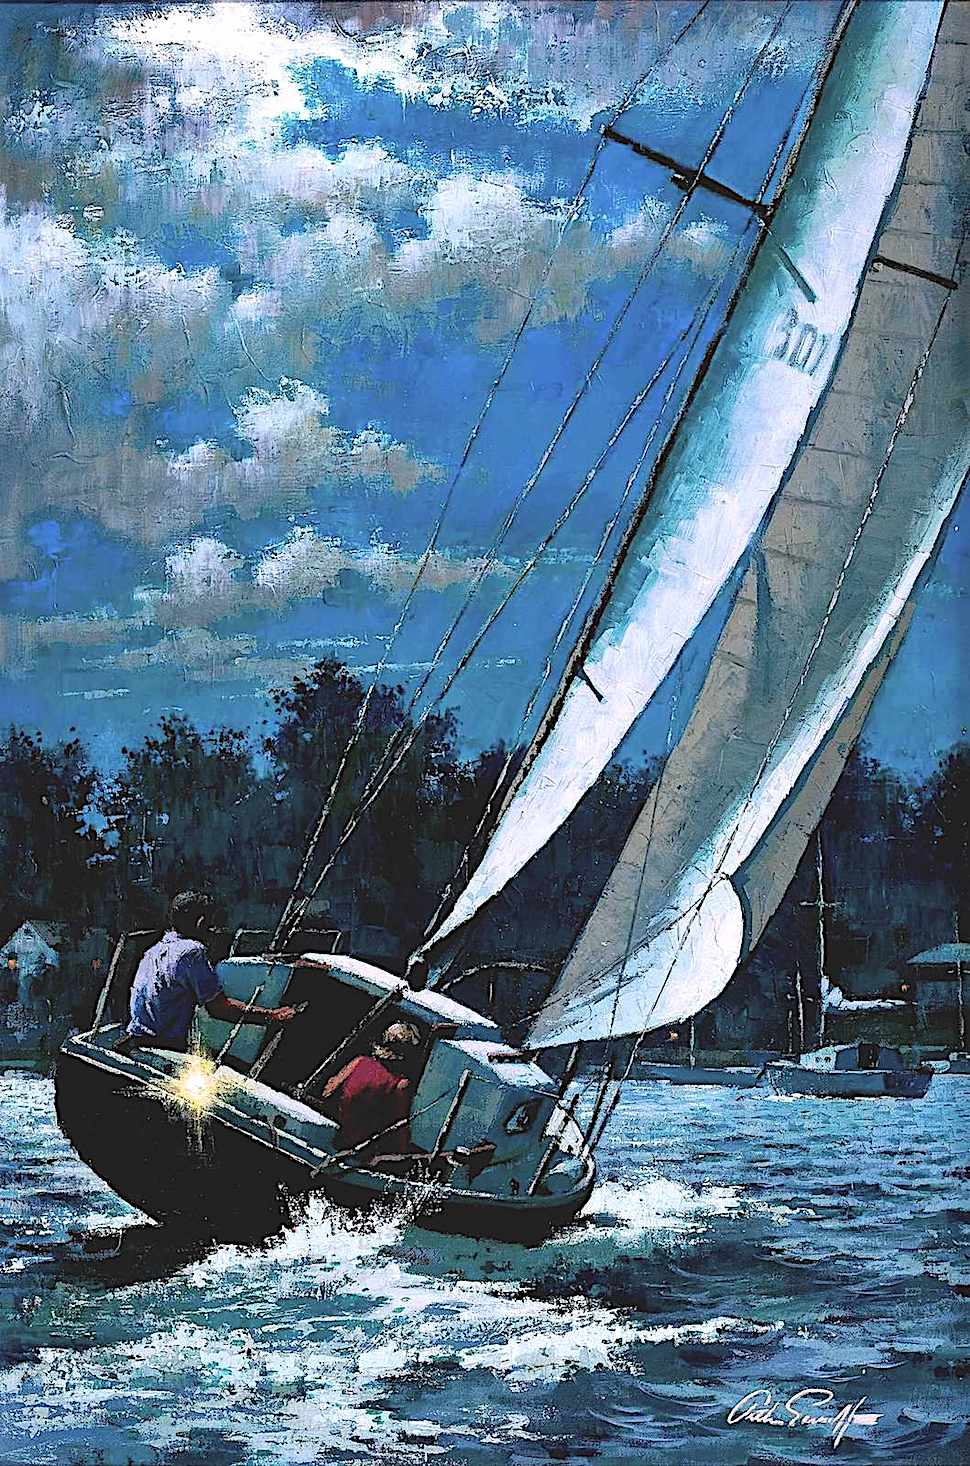 an Arthur Saron Sarnoff illustration of a sailboat in moonlight